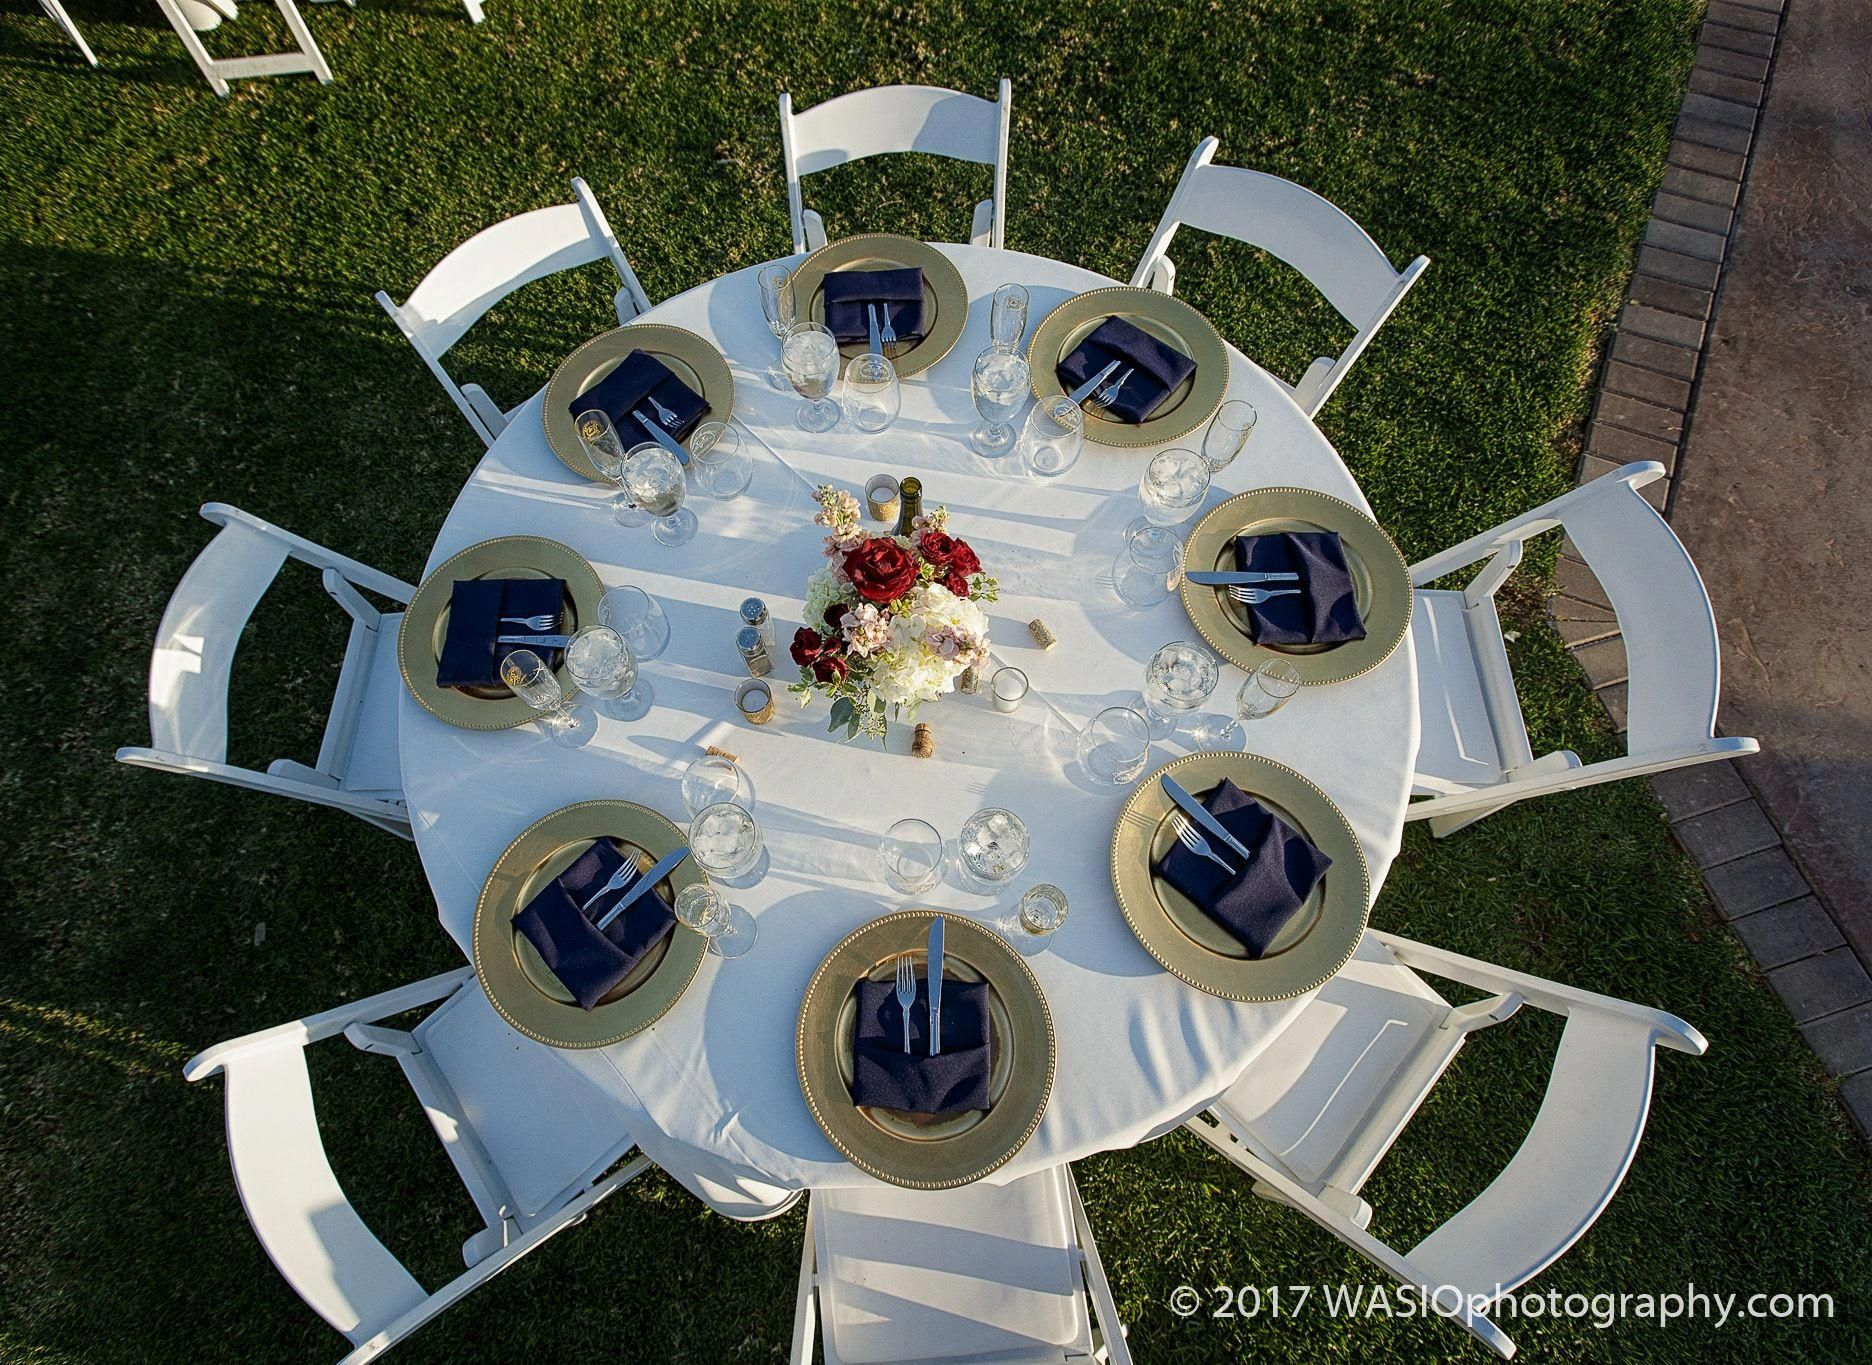 Order Wine Online Delivery Expensivewinegiftbaskets Californiawine Winery Weddings Temecula Weddings